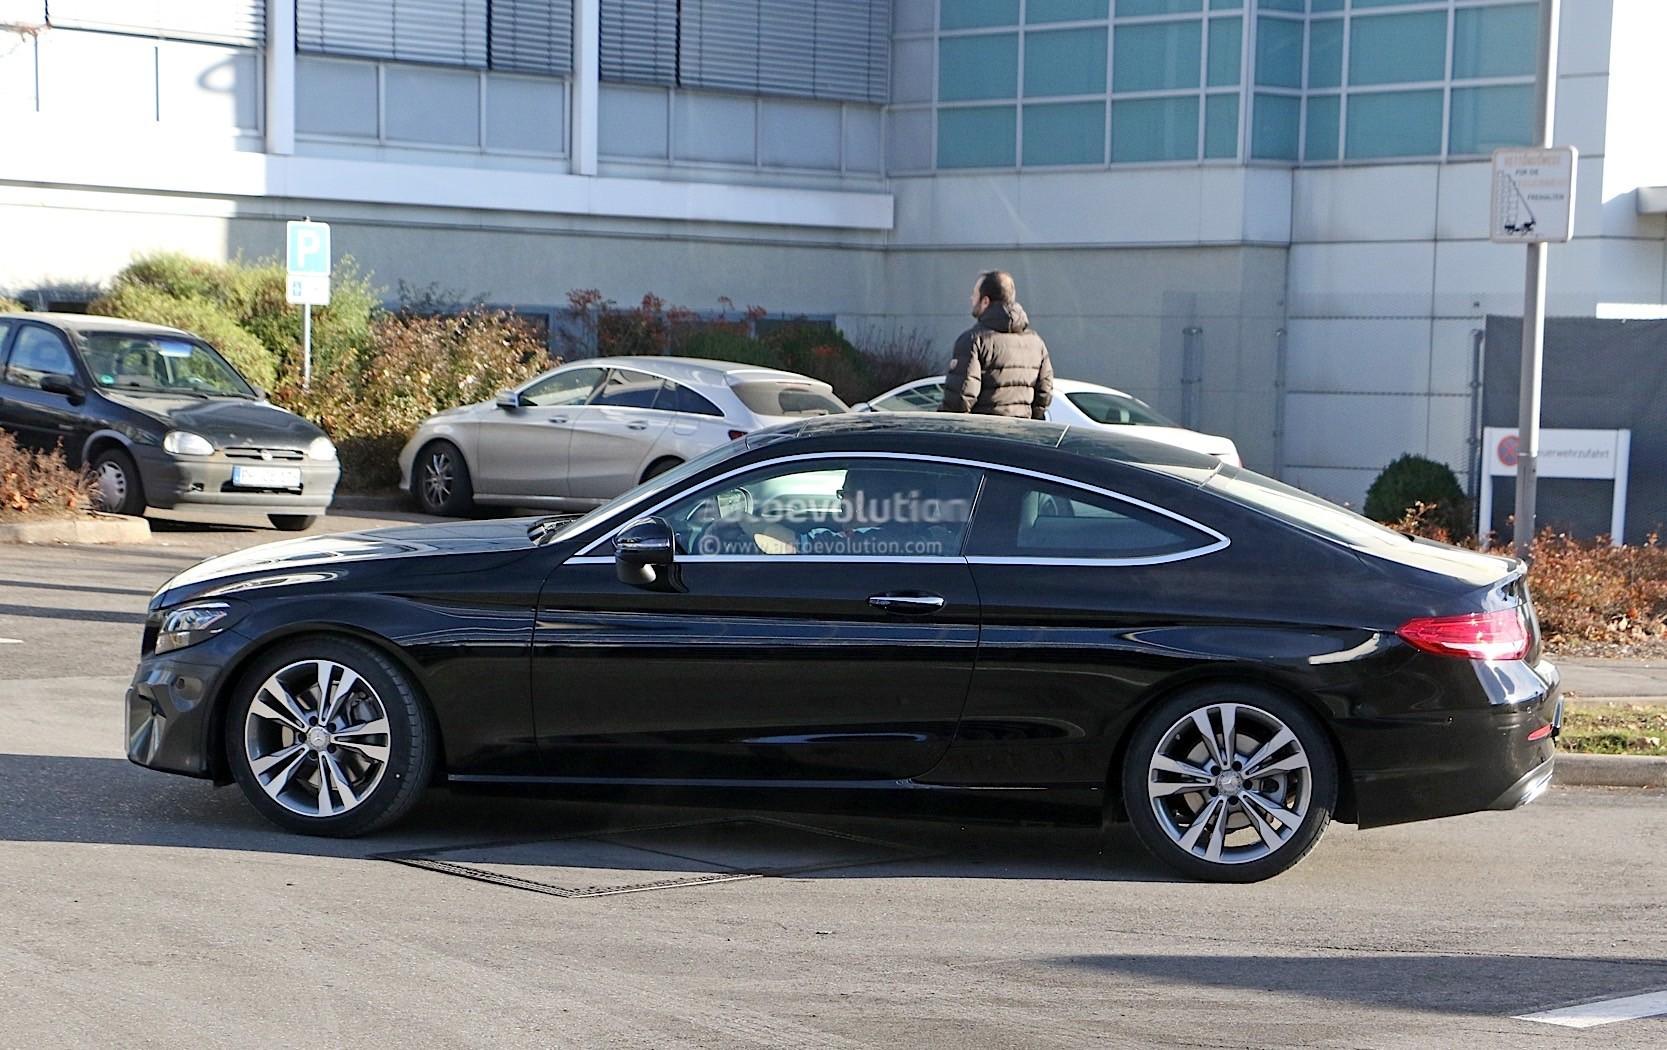 2015 - [Mercedes] Classe C Coupé & Cabriolet [C205/A205] - Page 15 2019-mercedes-benz-c-class-coupe-facelift-shows-all-new-led-headlamps_4